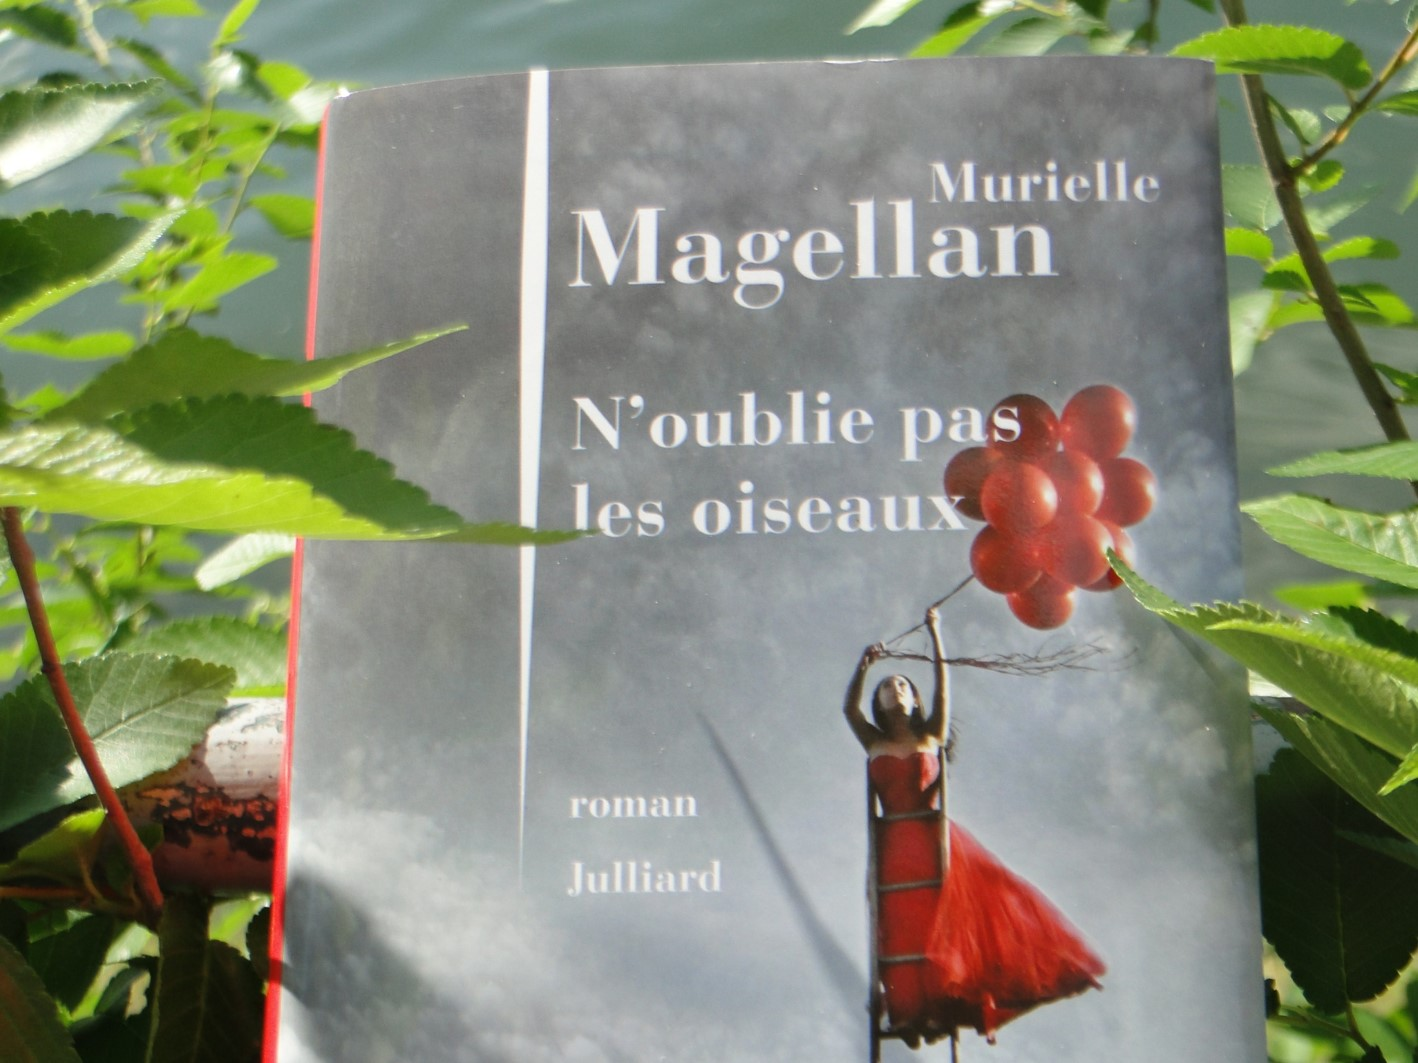 N'OUBLIES PAS LES OISEAUX Murielle Magellan - Go with the Blog